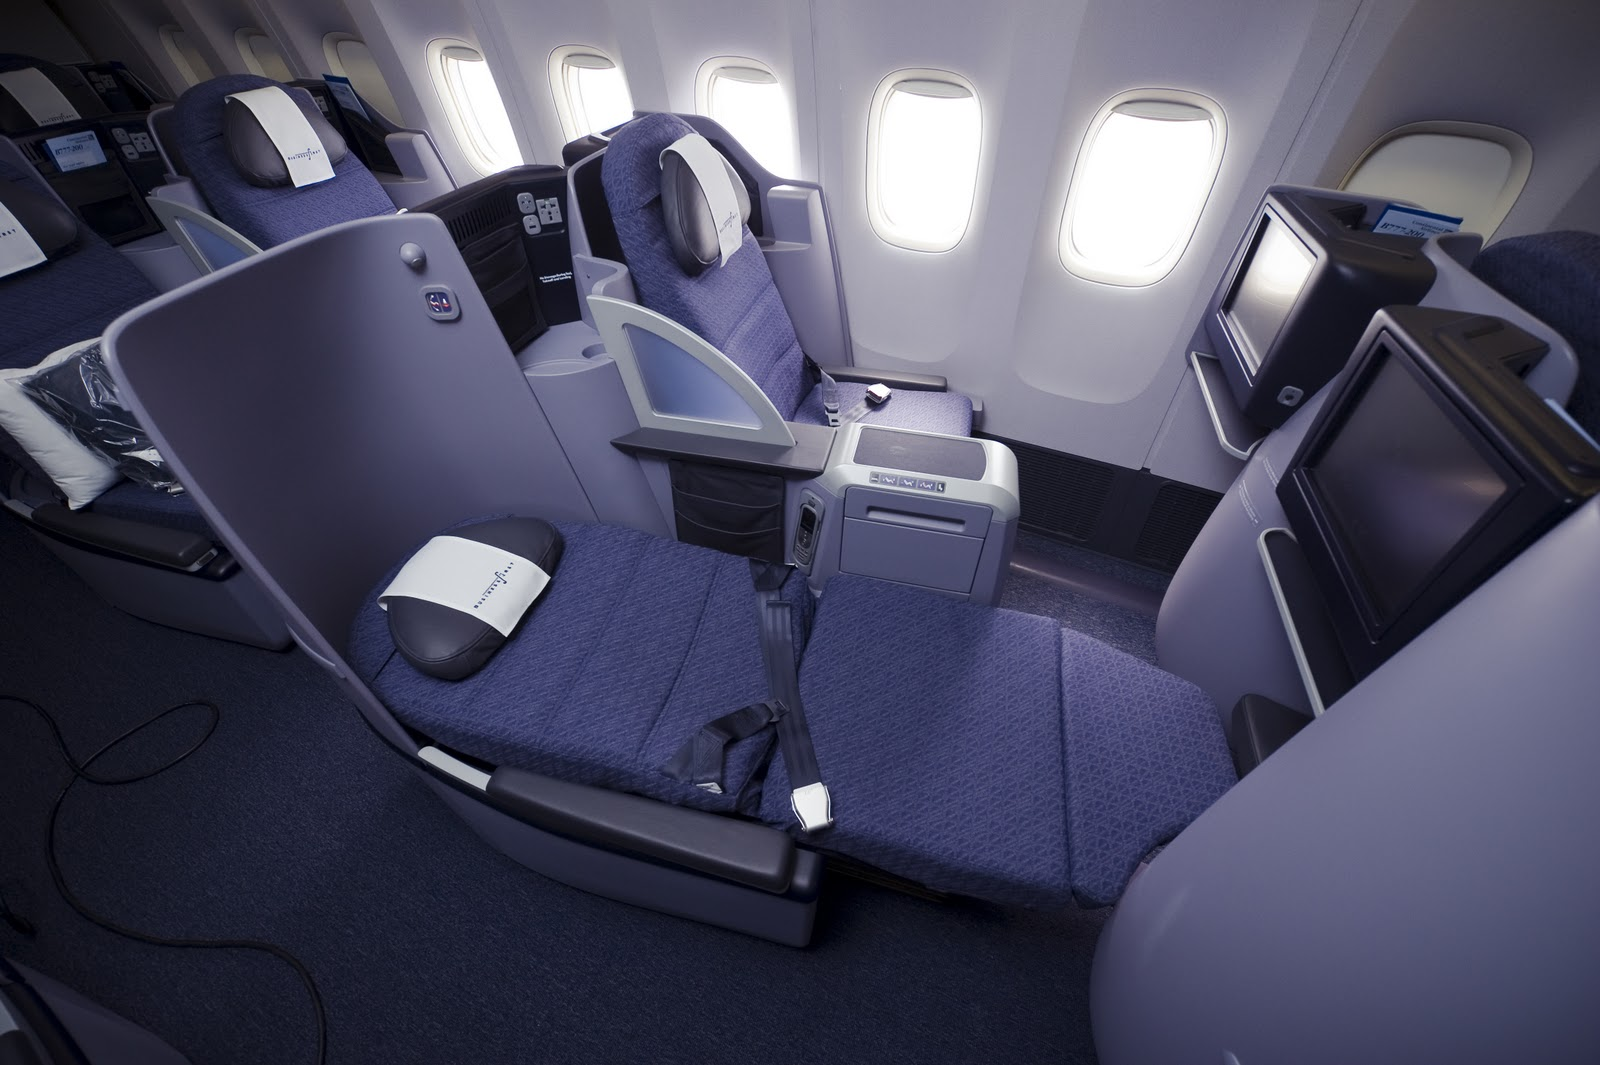 777er Floor Plan Sitzplatzschema Aeroflot Sitzplan China